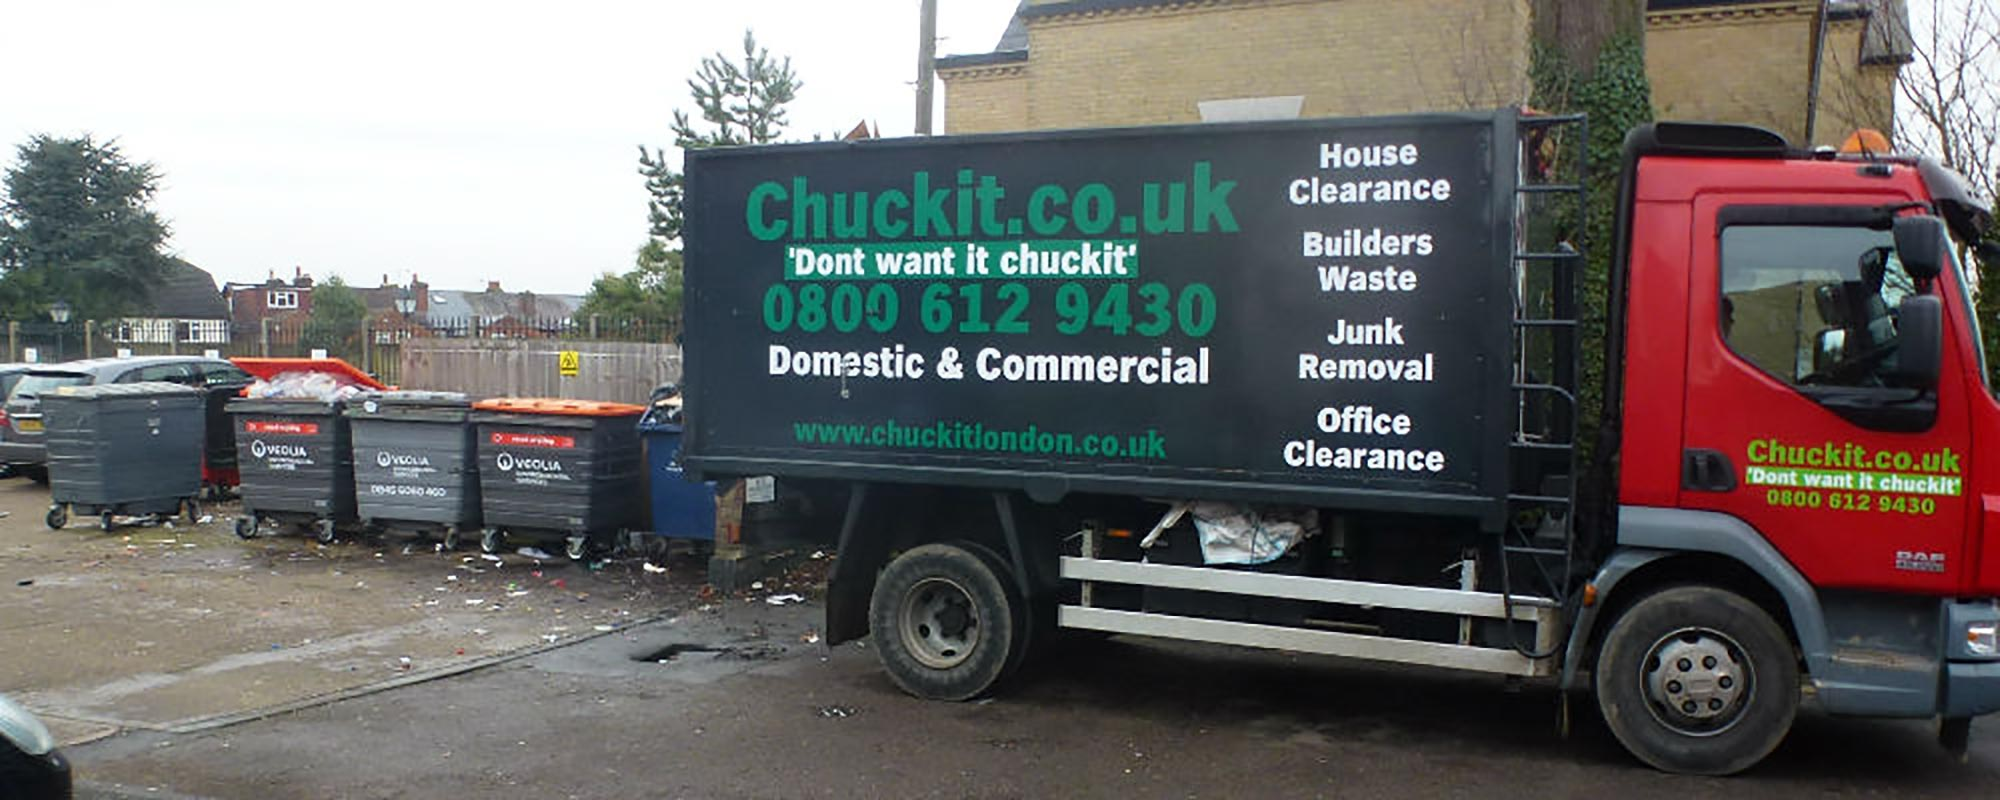 Glass Bottle Recycling London